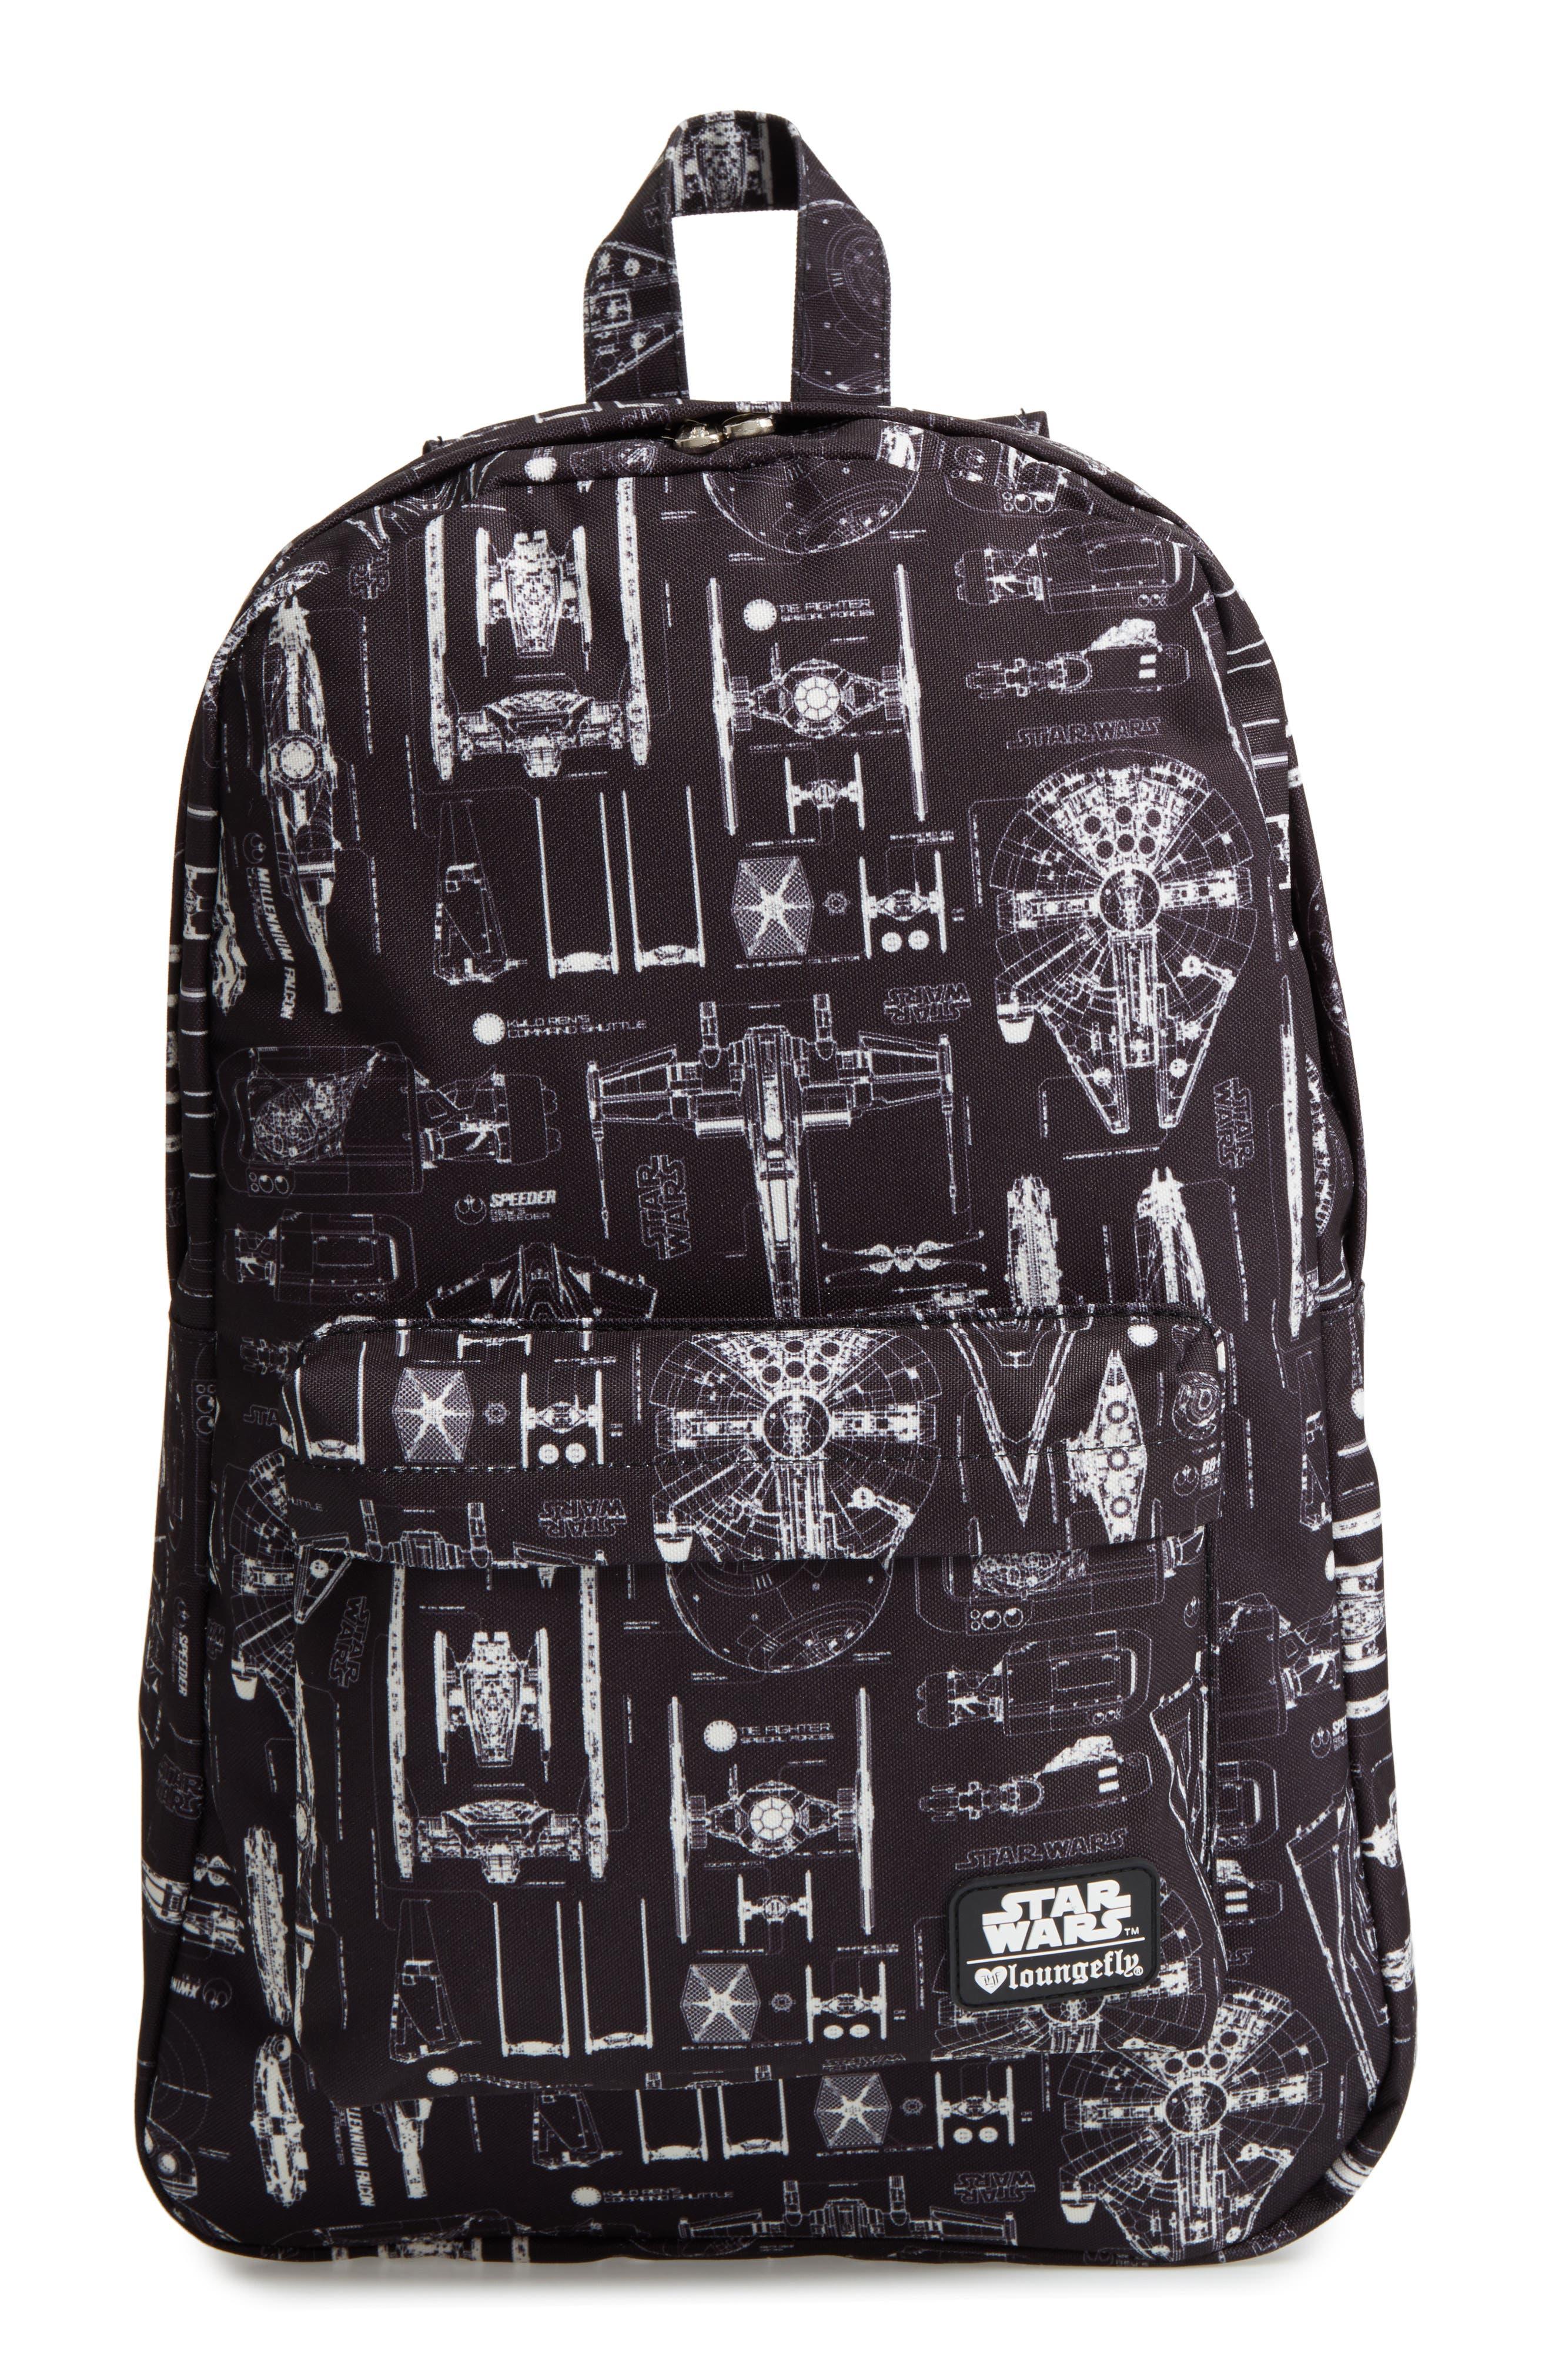 Star Wars<sup>™</sup> The Force Awakens Blueprint Backpack,                             Main thumbnail 1, color,                             Black